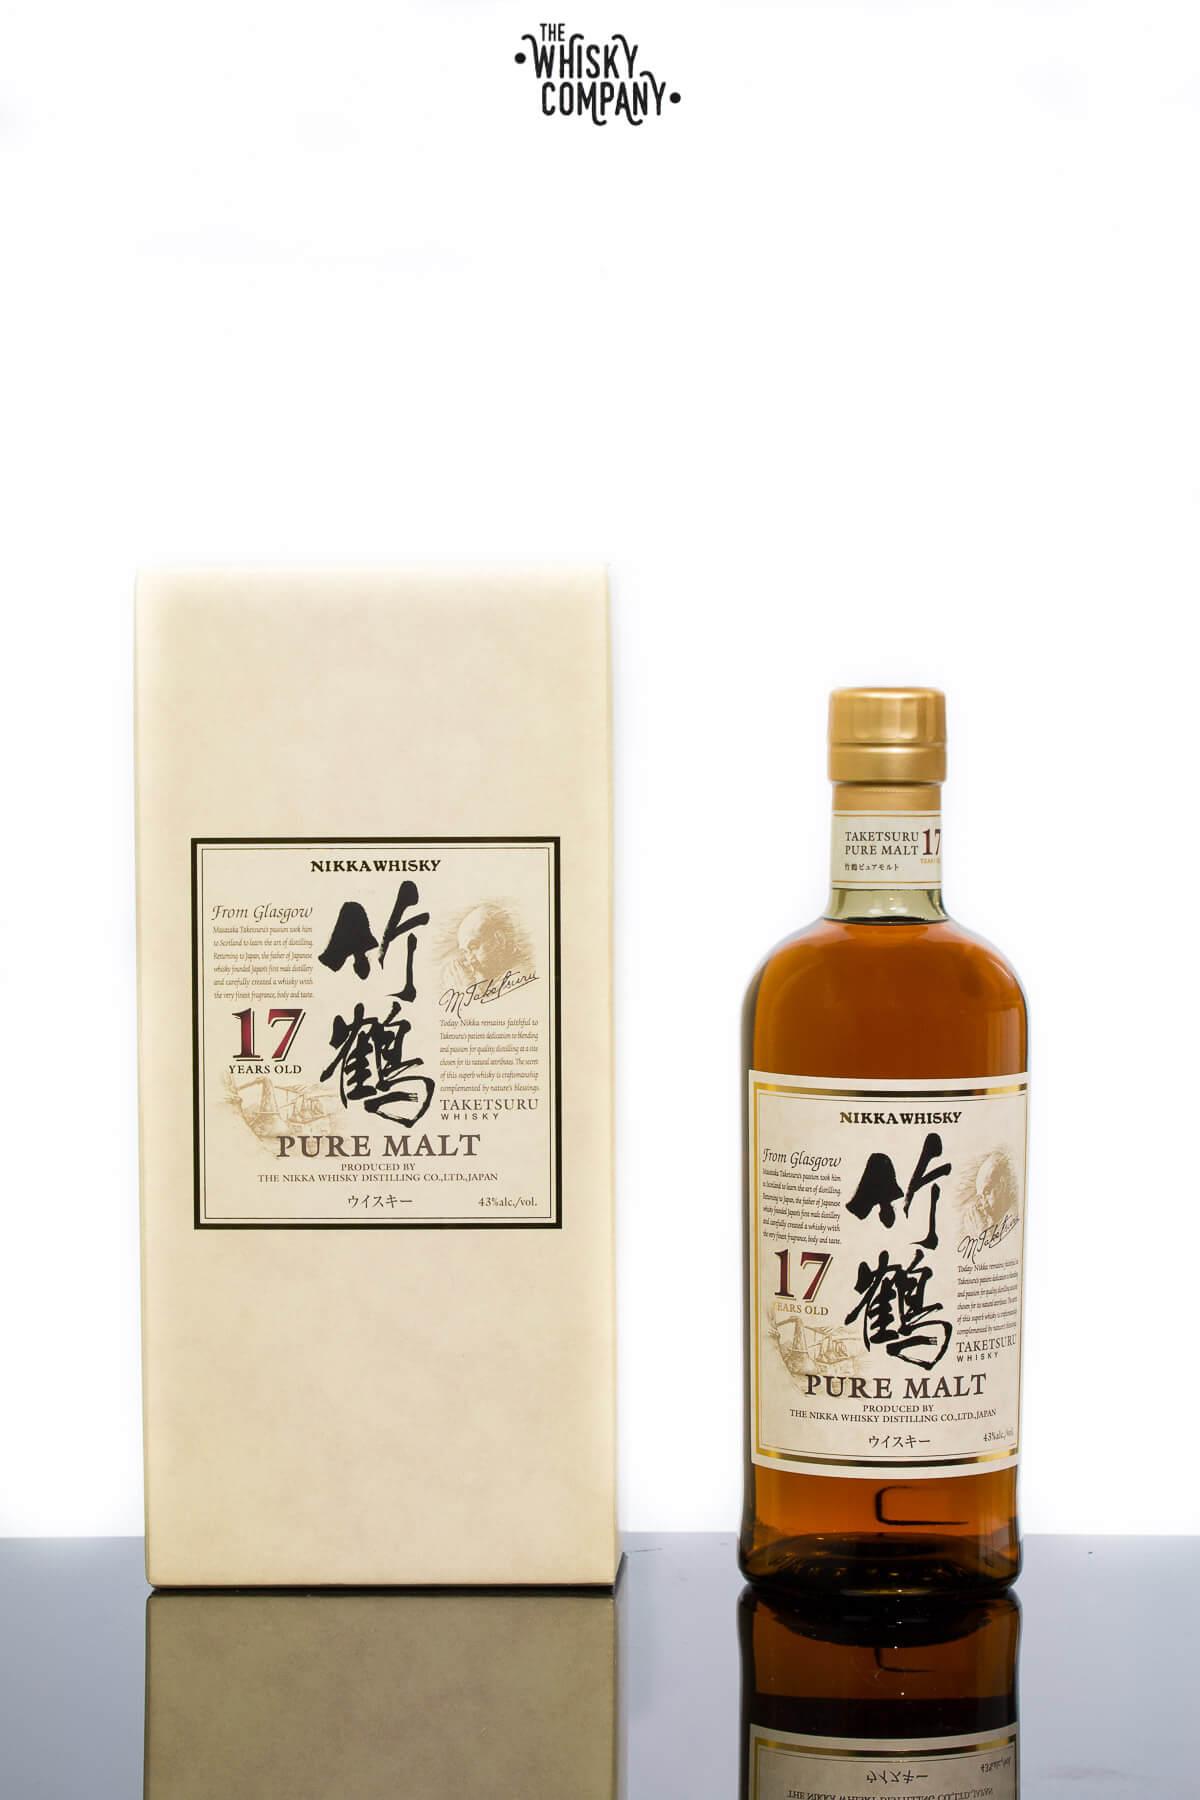 Nikka Taketsuru 17 Years Old Pure Malt Japanese Blended Whisky